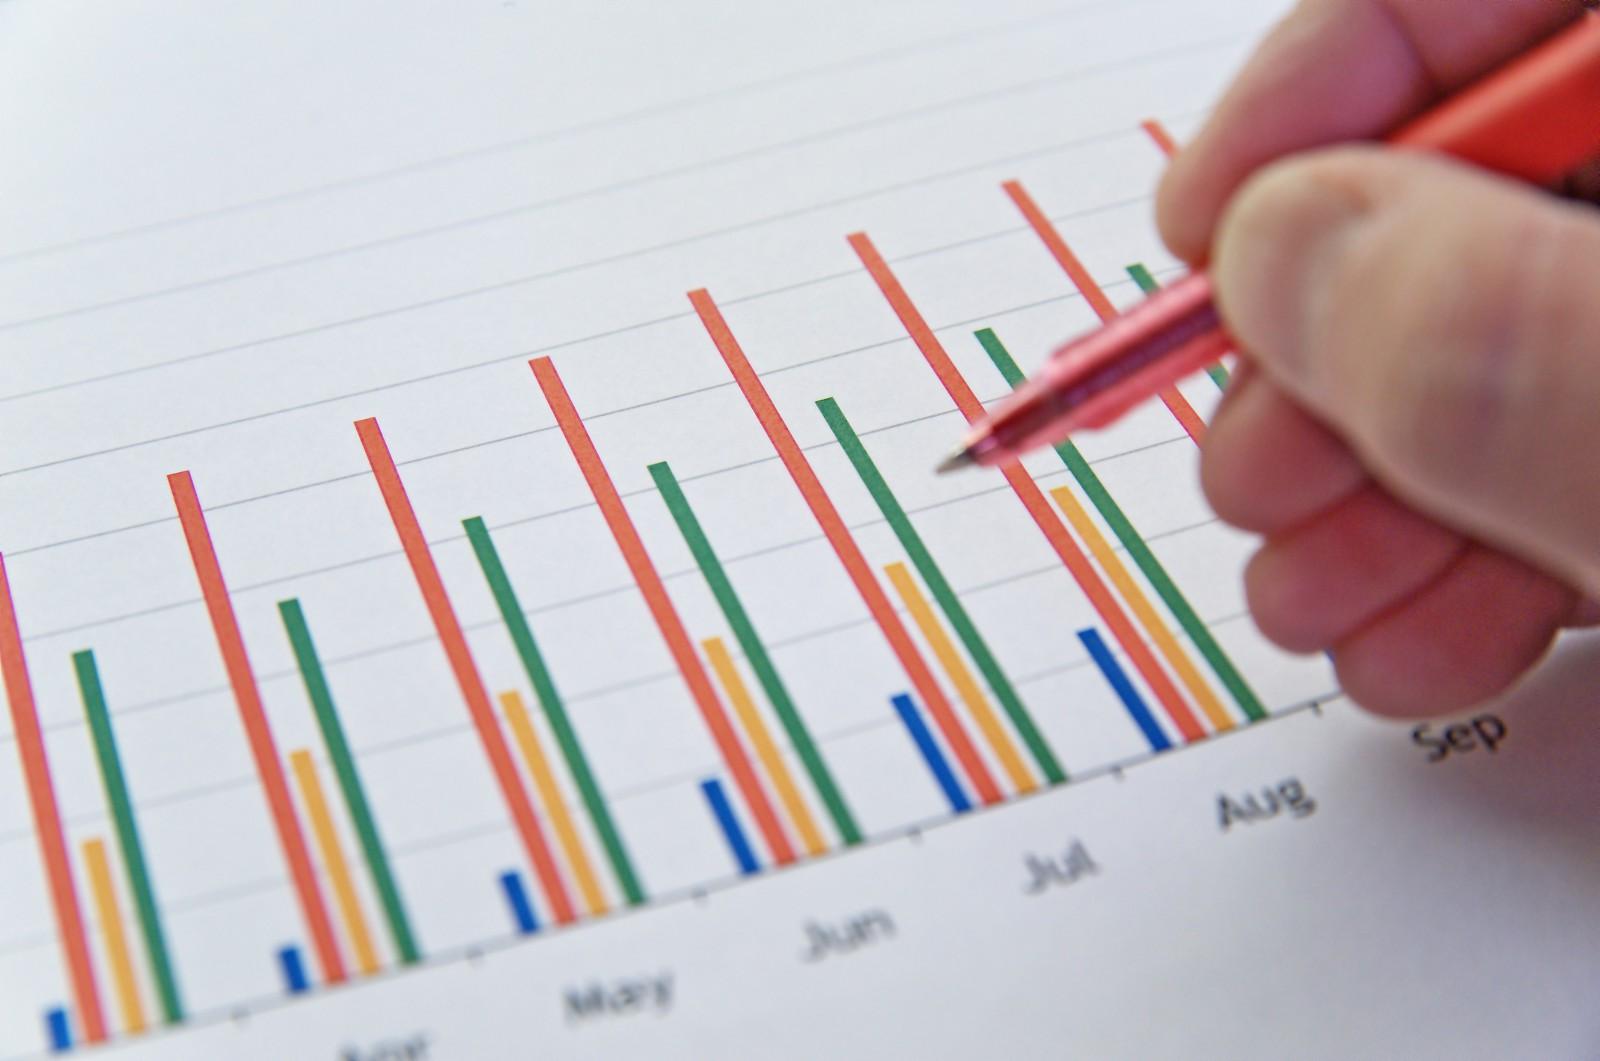 Monroe Capital - Testing The Reliability Of NAV (NASDAQ:MRCC)